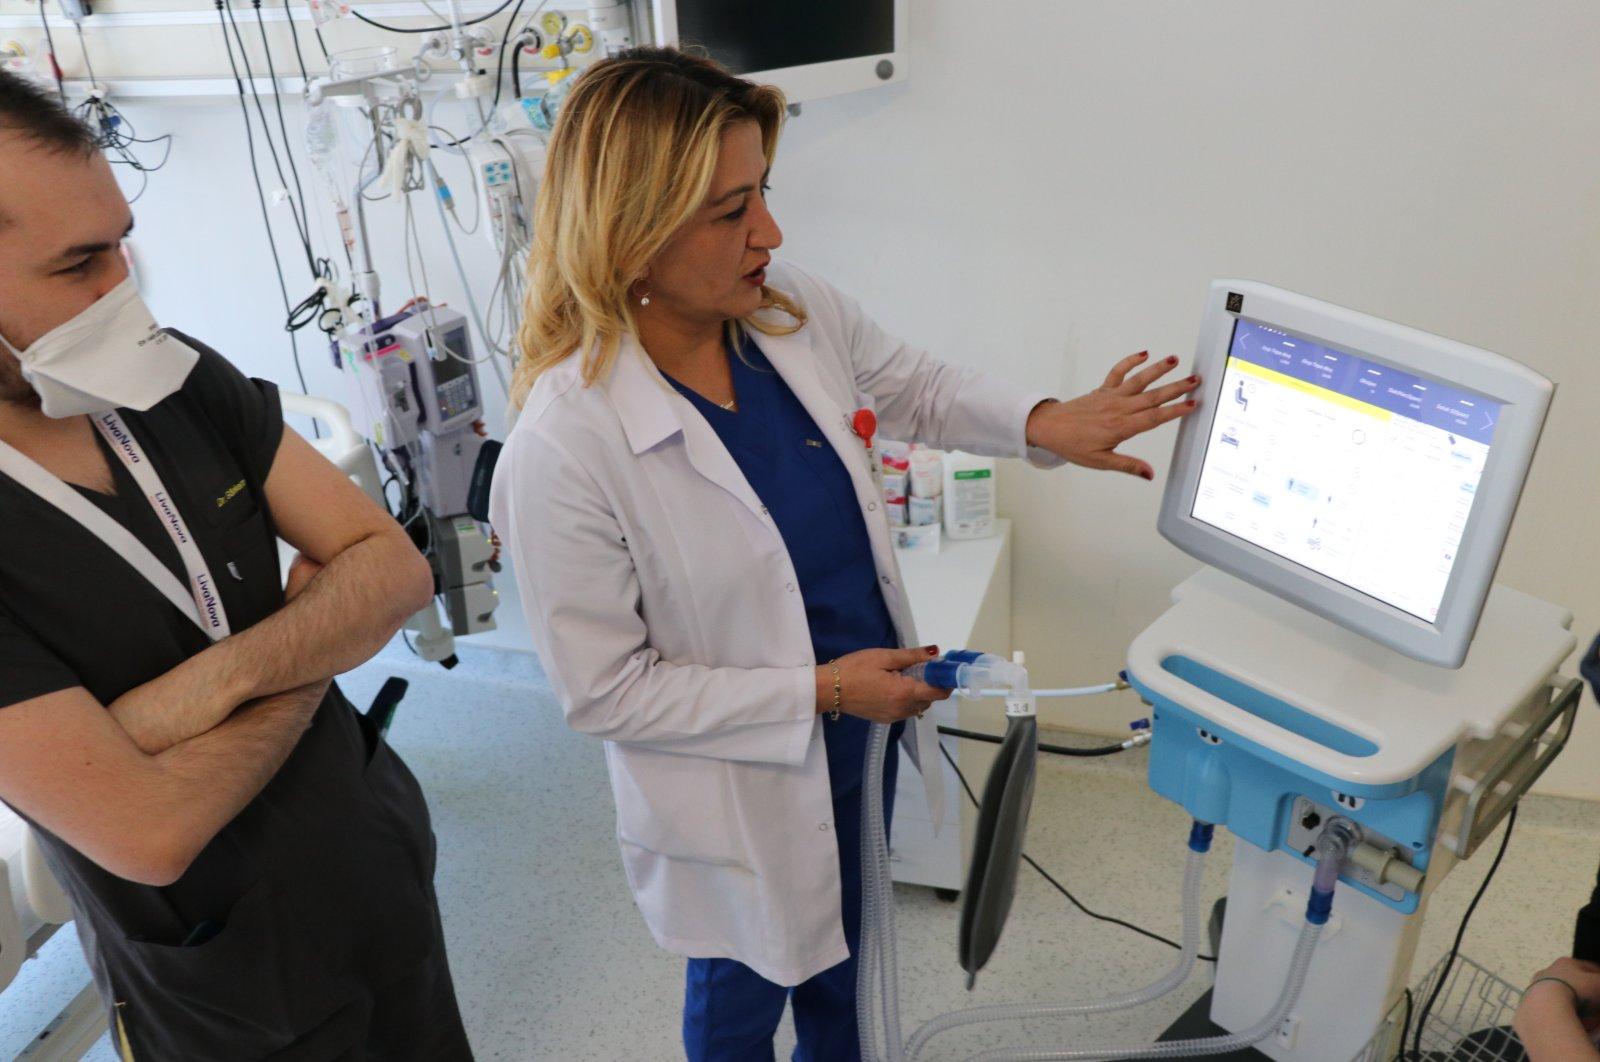 Sema Kultufan Turan (R), a member of Health Ministry's Coronavirus Science Board, tests the domestically made ventilator at a hospital in Ankara, Turkey, April 24, 2020. (AA Photo)